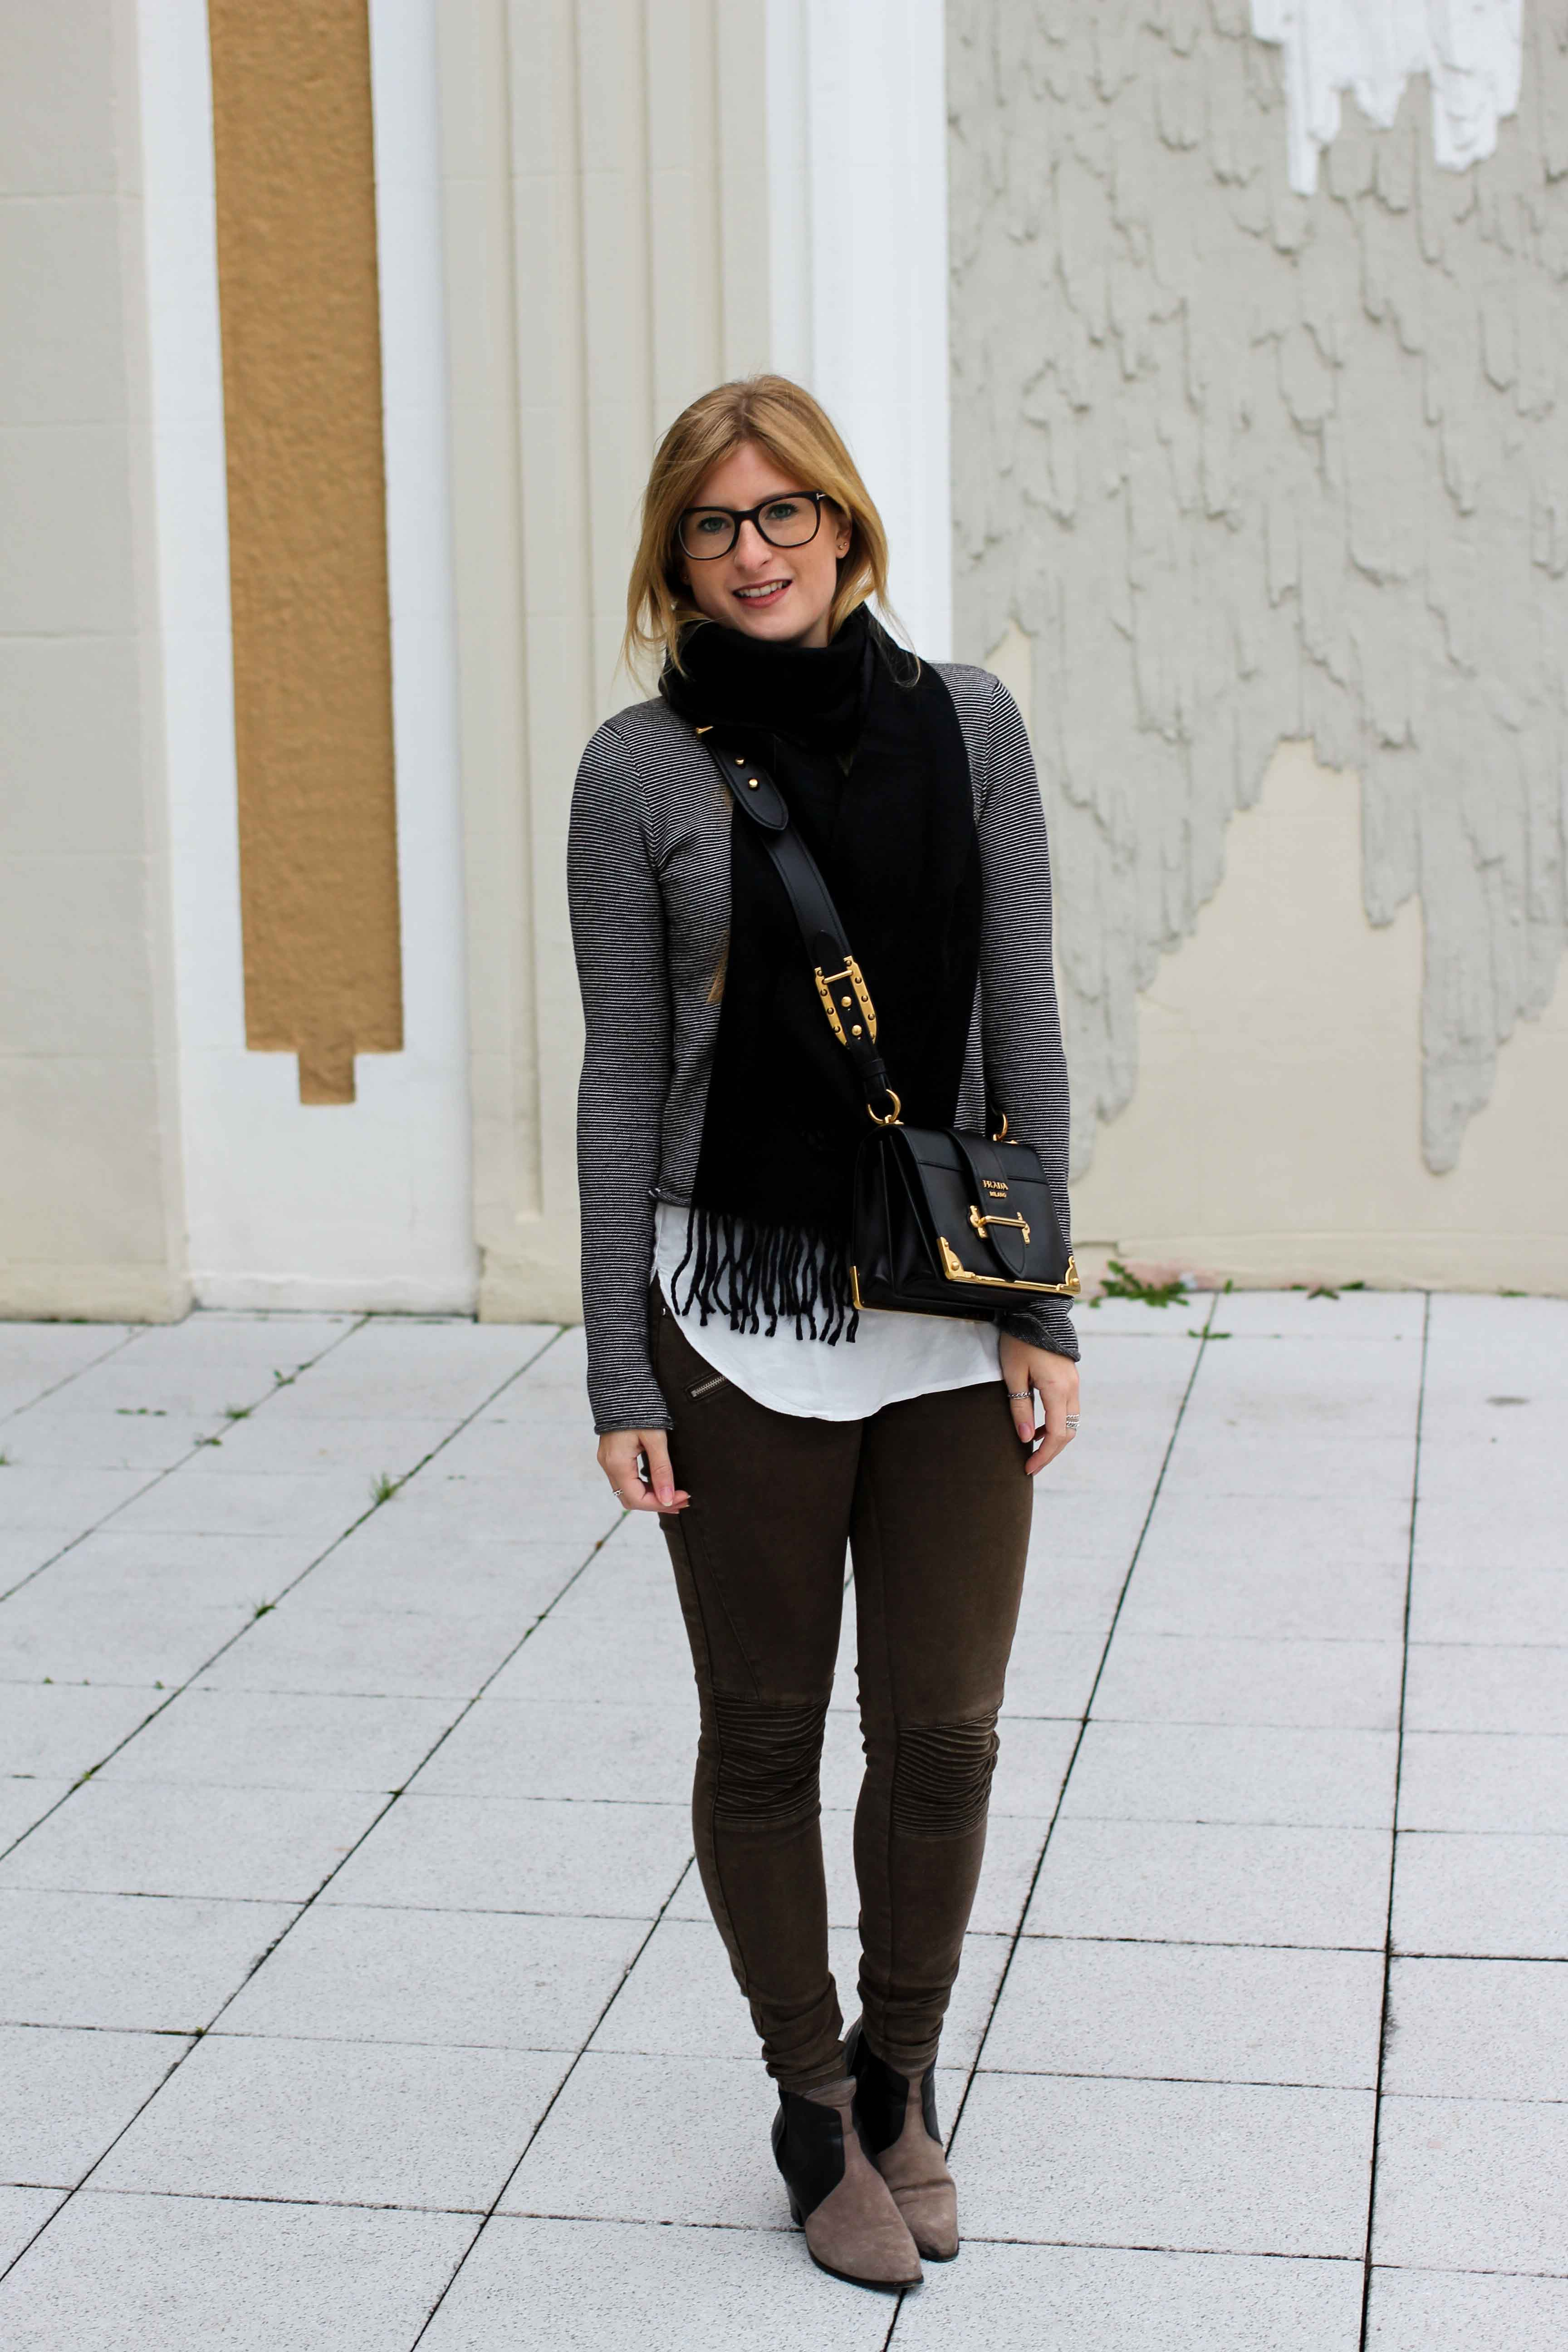 Casual Jeans Look Zara Pullover Schal Winteroutfit Prada Tasche schwarz Modeblogger 1